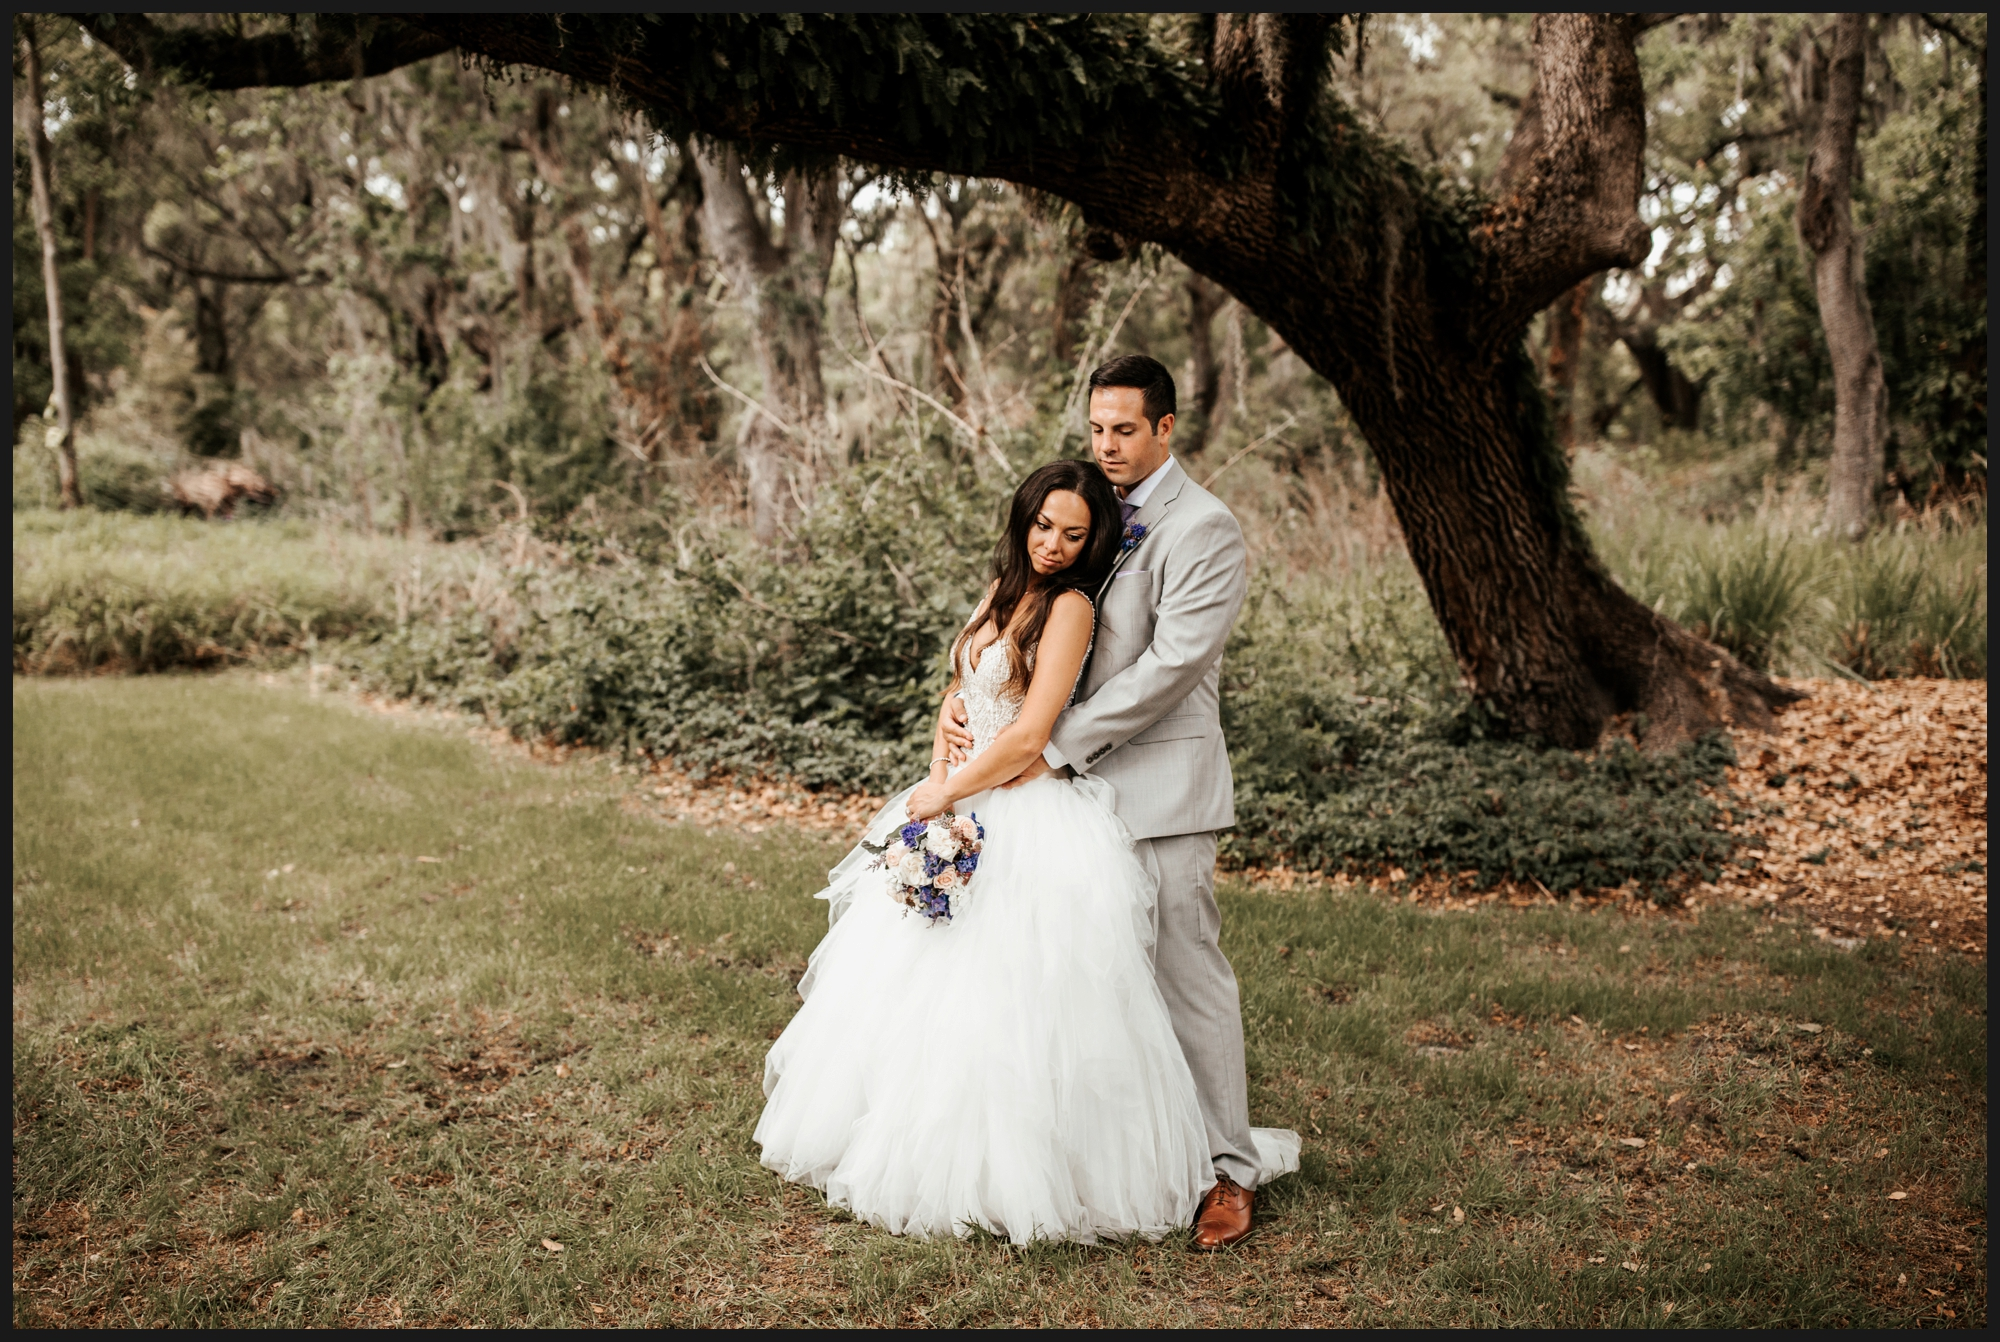 Orlando-Wedding-Photographer-destination-wedding-photographer-florida-wedding-photographer-bohemian-wedding-photographer_1640.jpg